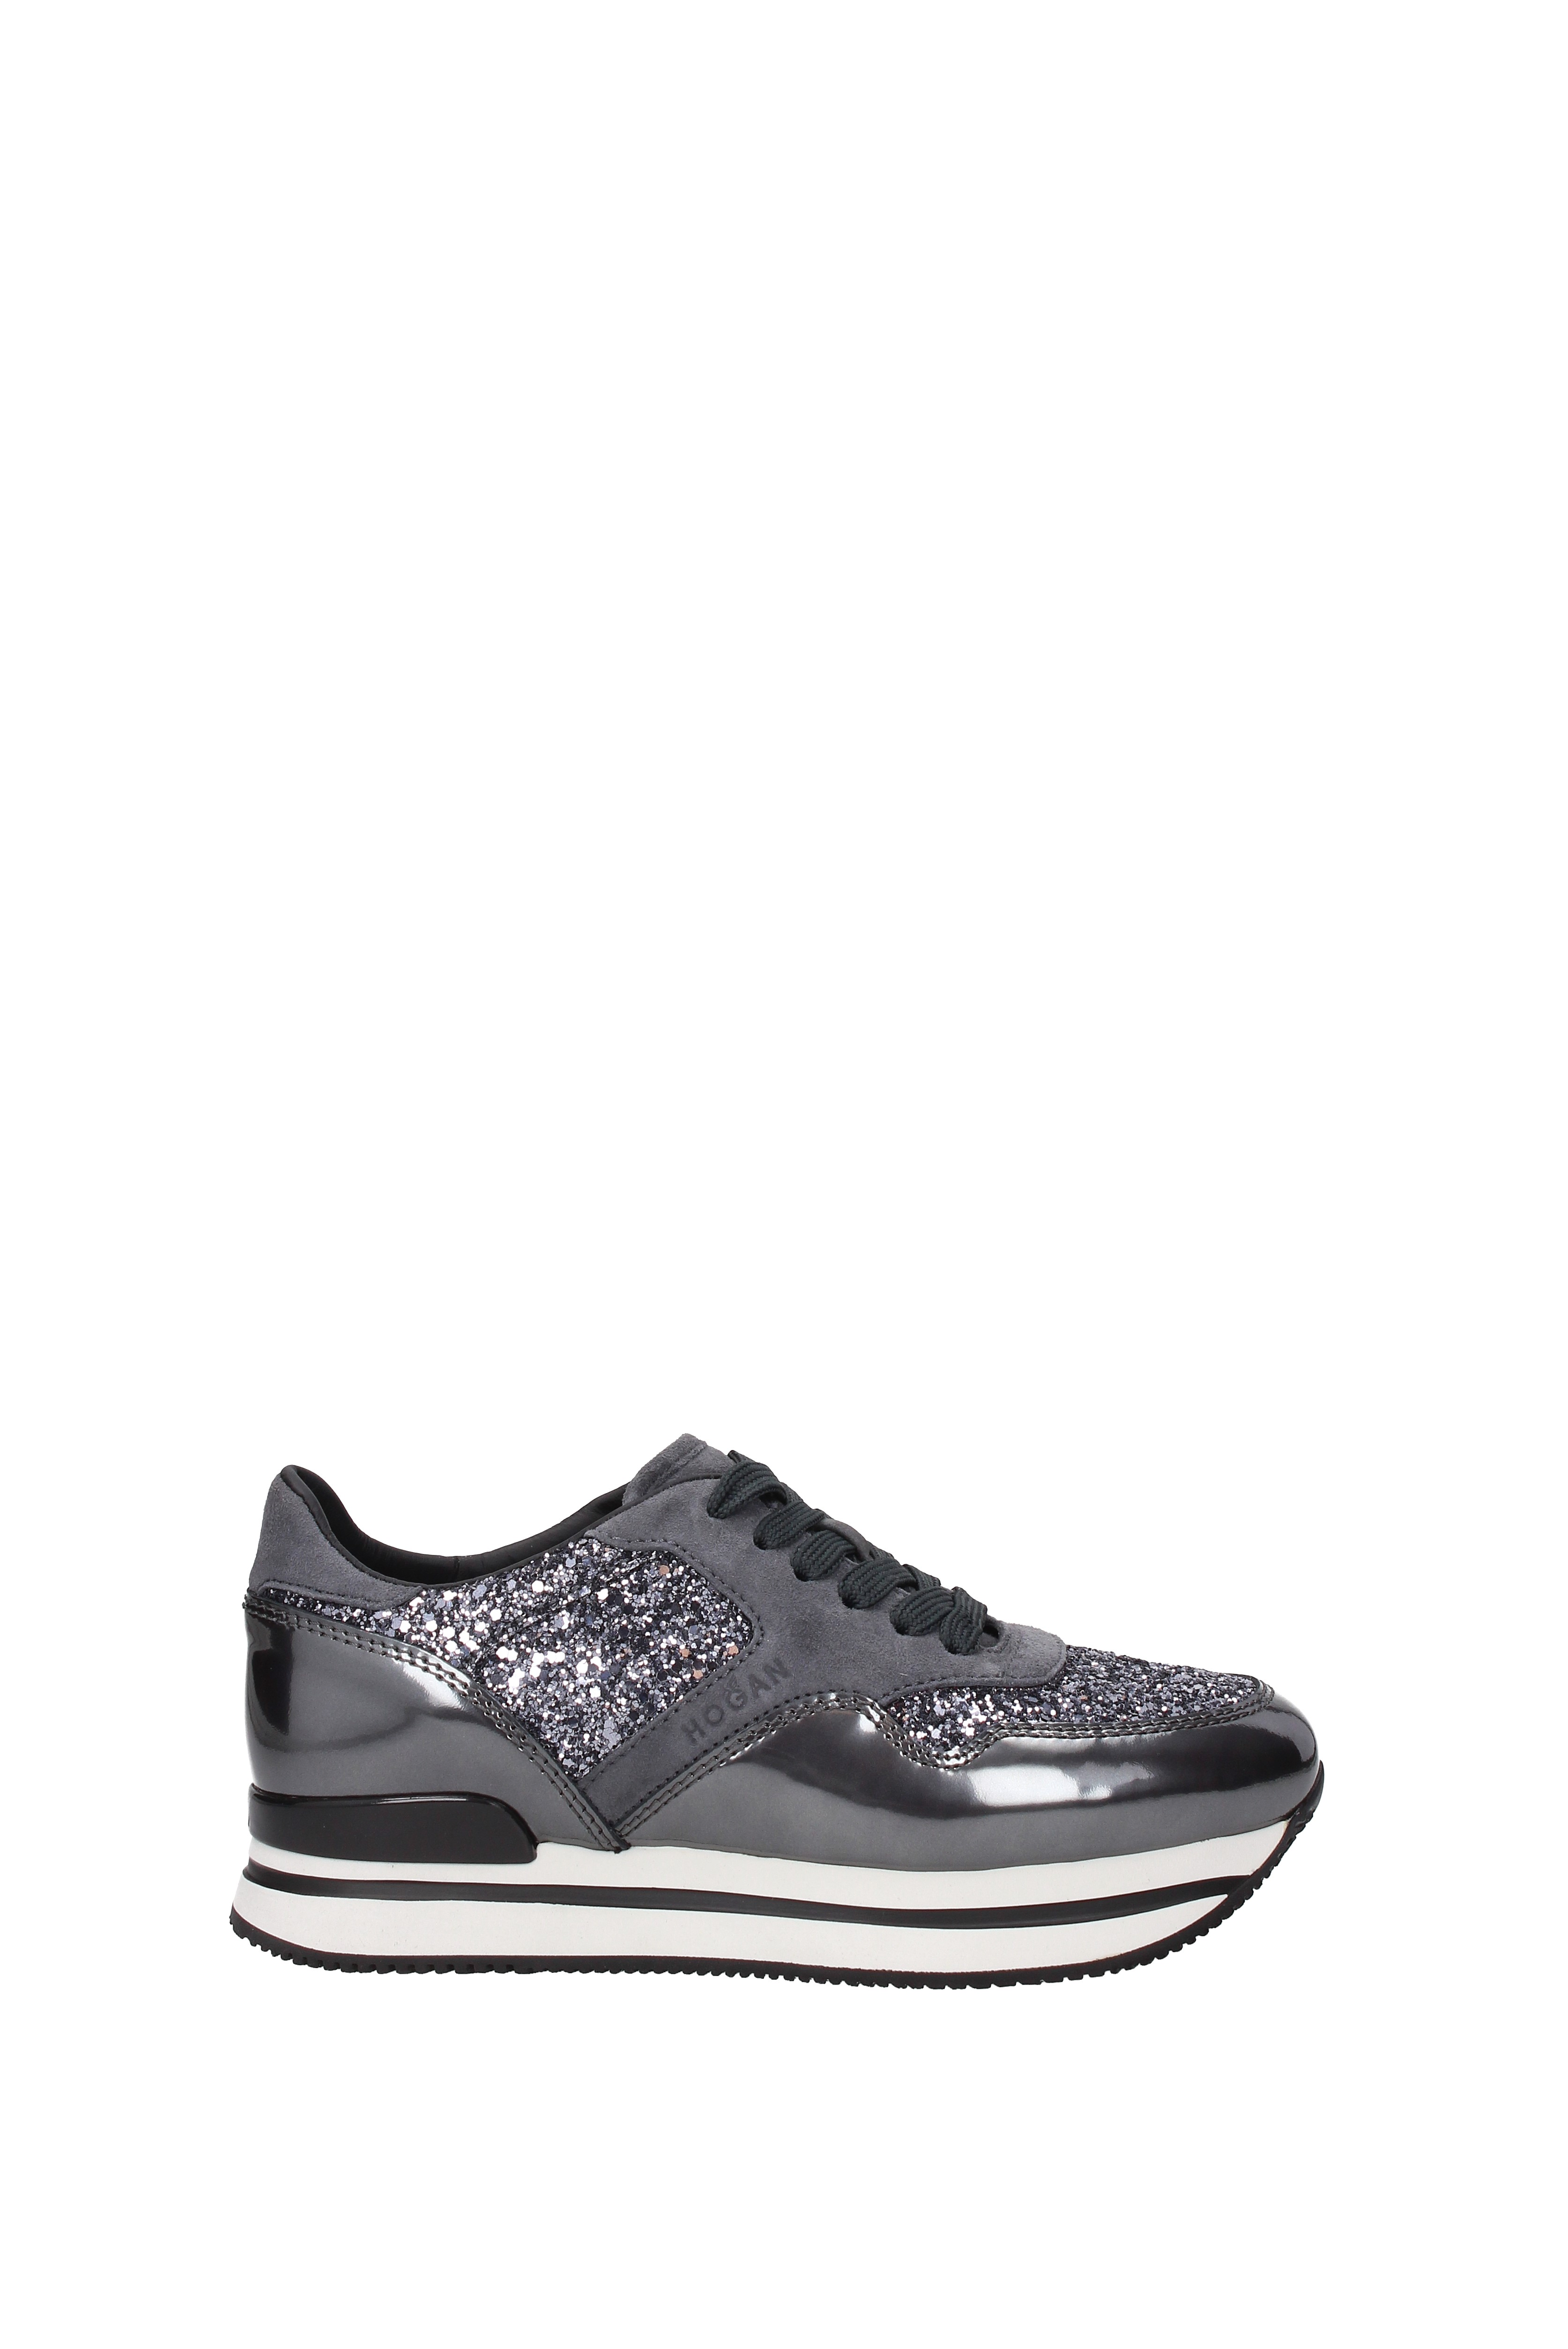 Sneakers (HXW2220N622CRN) Hogan Women - Glitter (HXW2220N622CRN) Sneakers a5d3b5